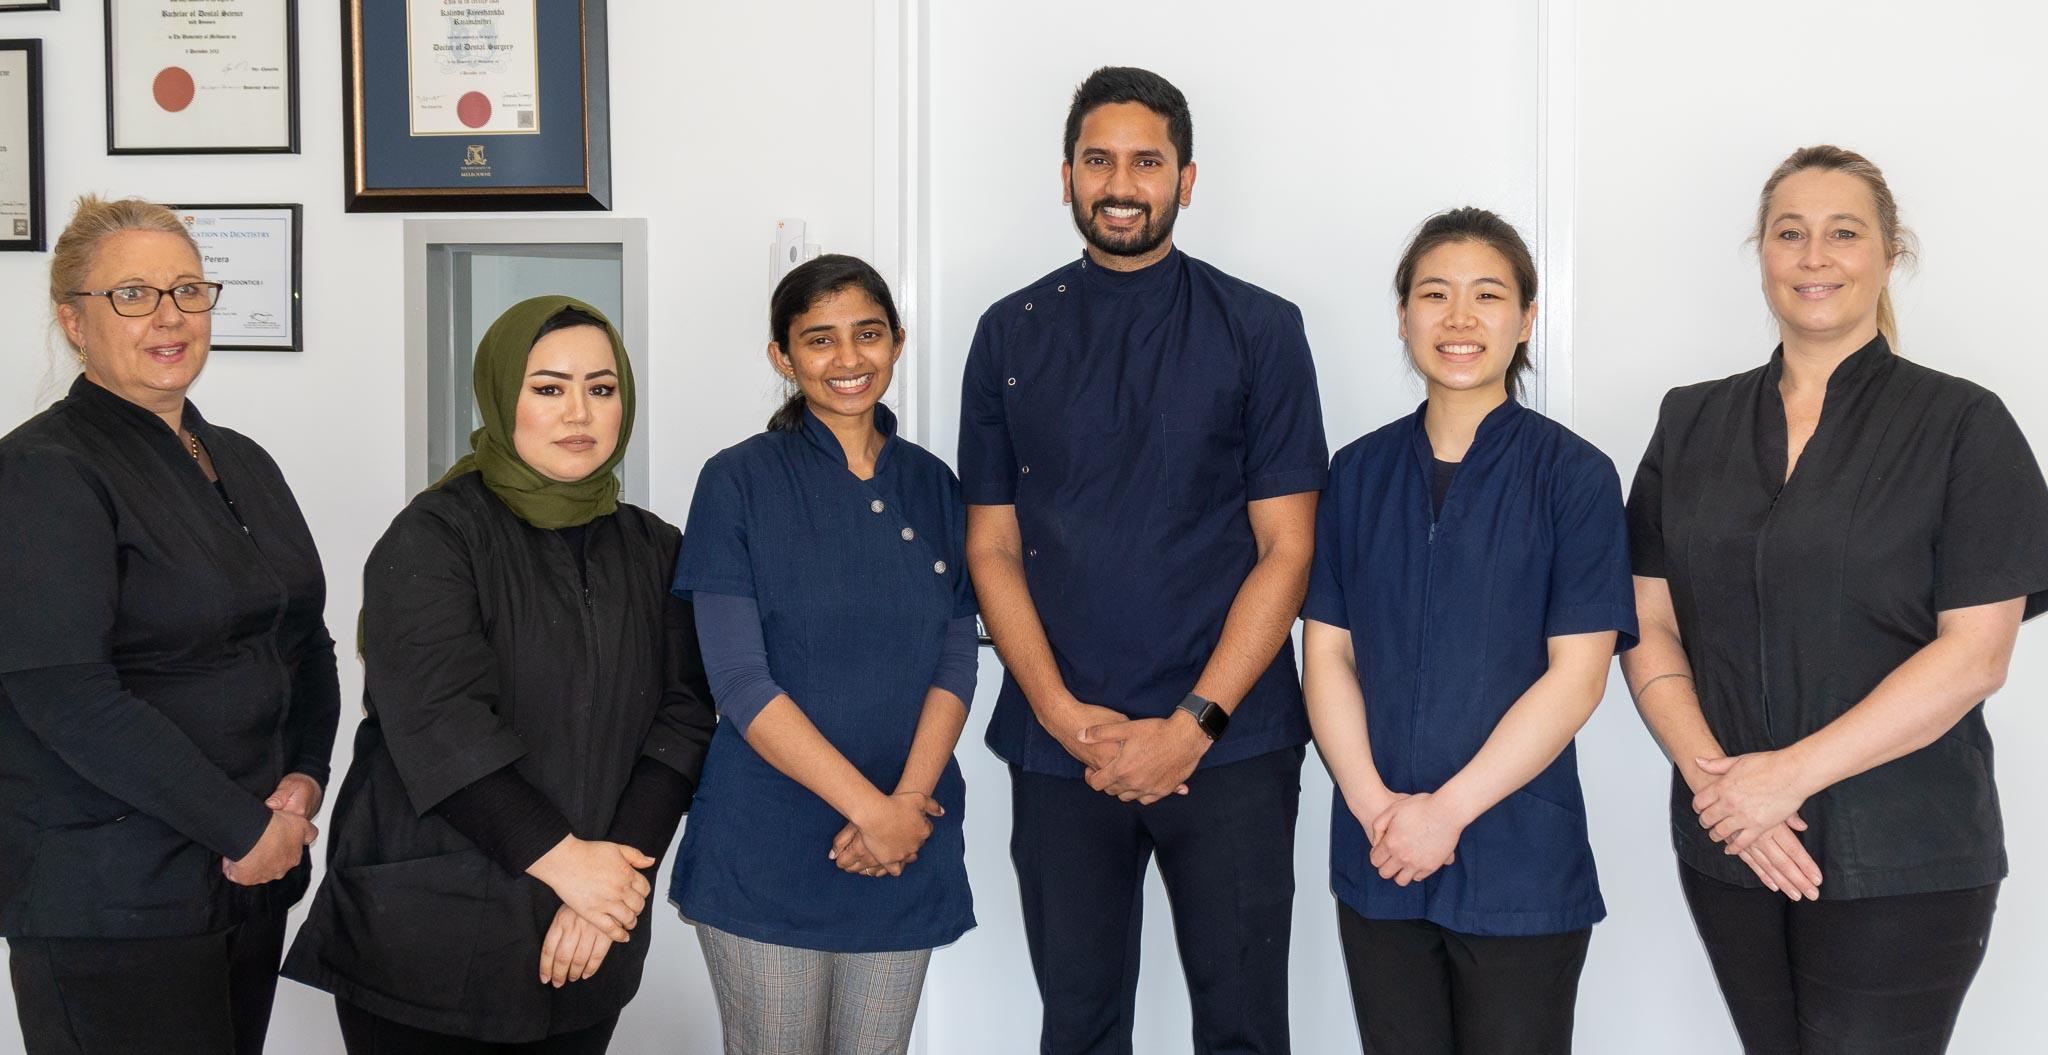 Mulgrave Dental Group team photo